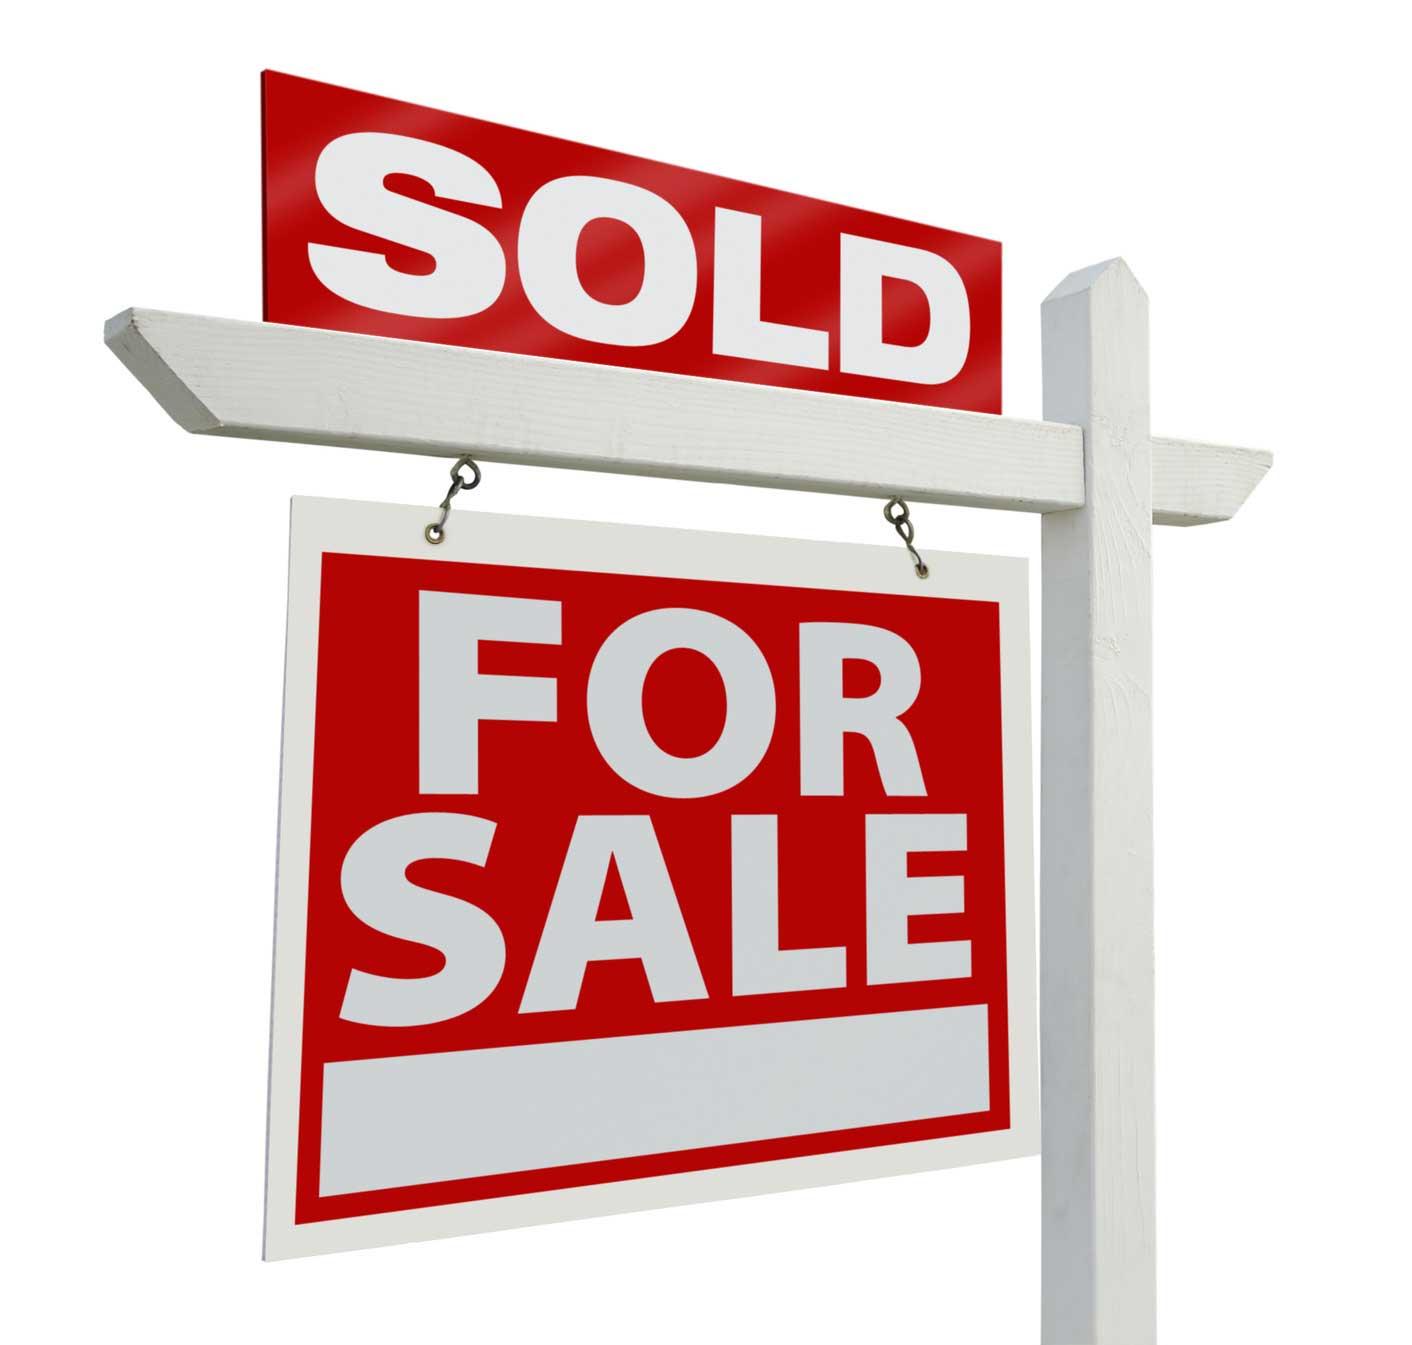 Salina Board Of Realtors Release April Home Sale Figures